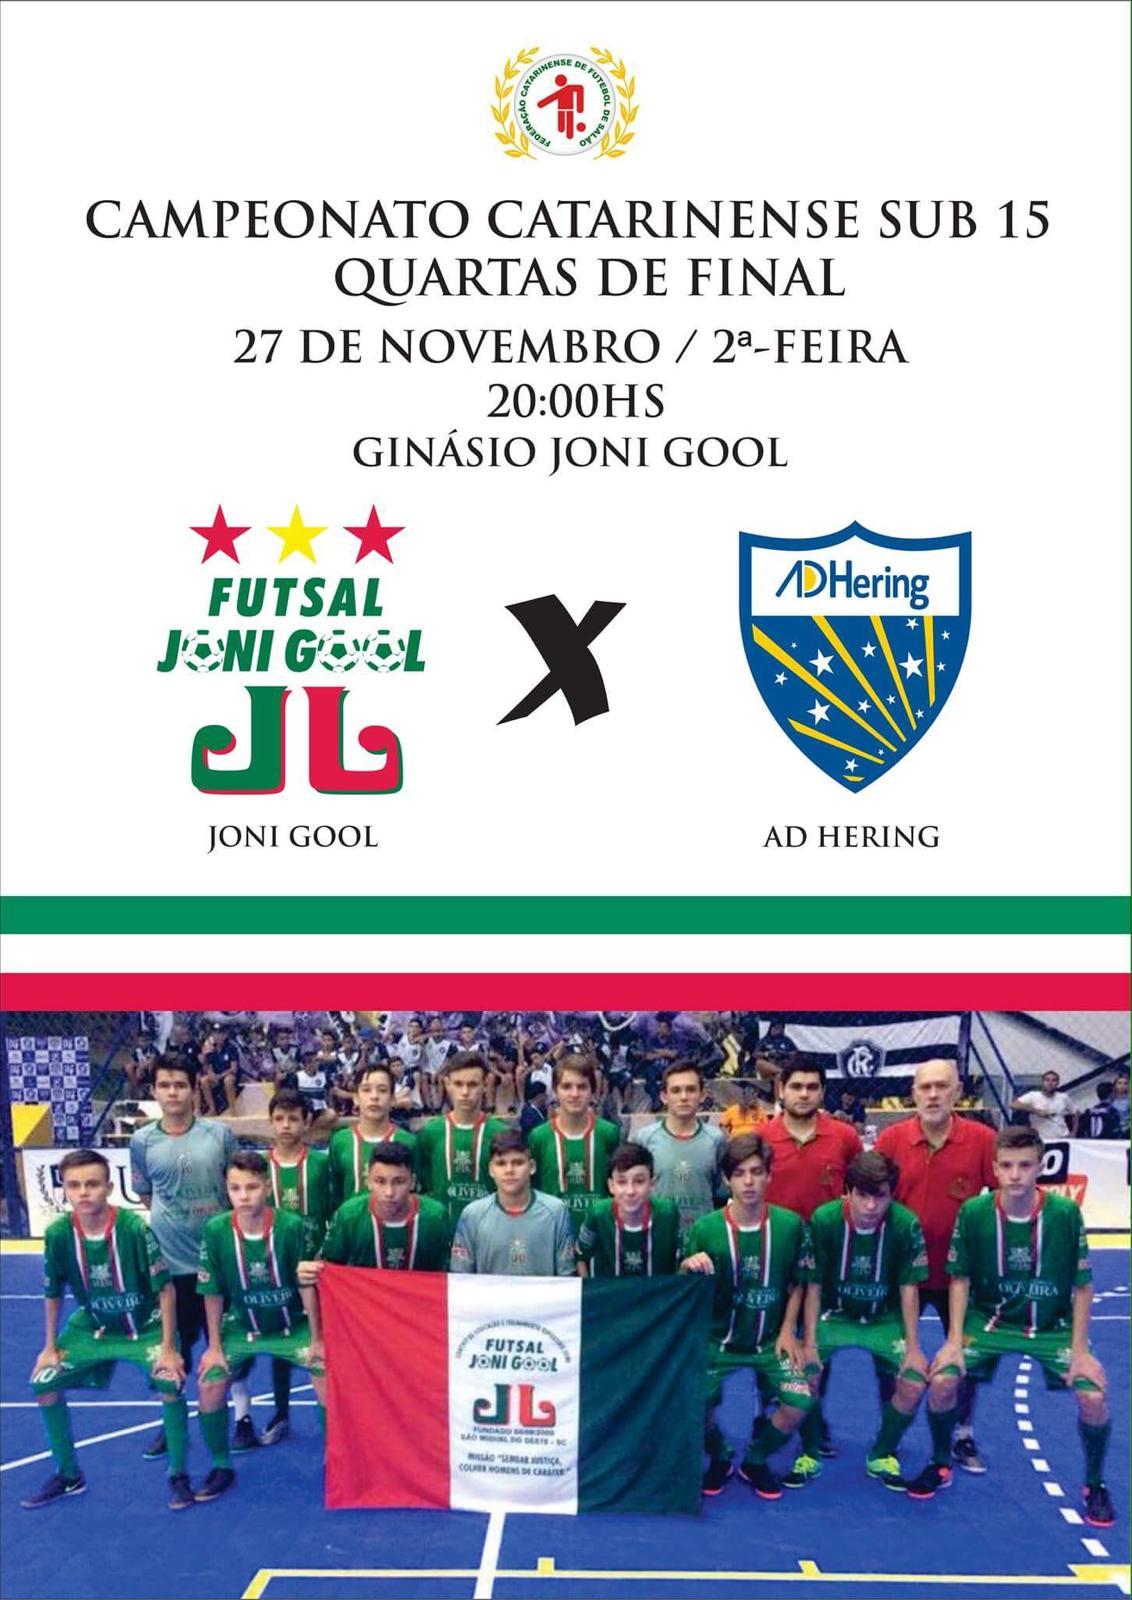 Su-15 do Joni Gool decide vaga no Campeonato Catarinense nesta segunda